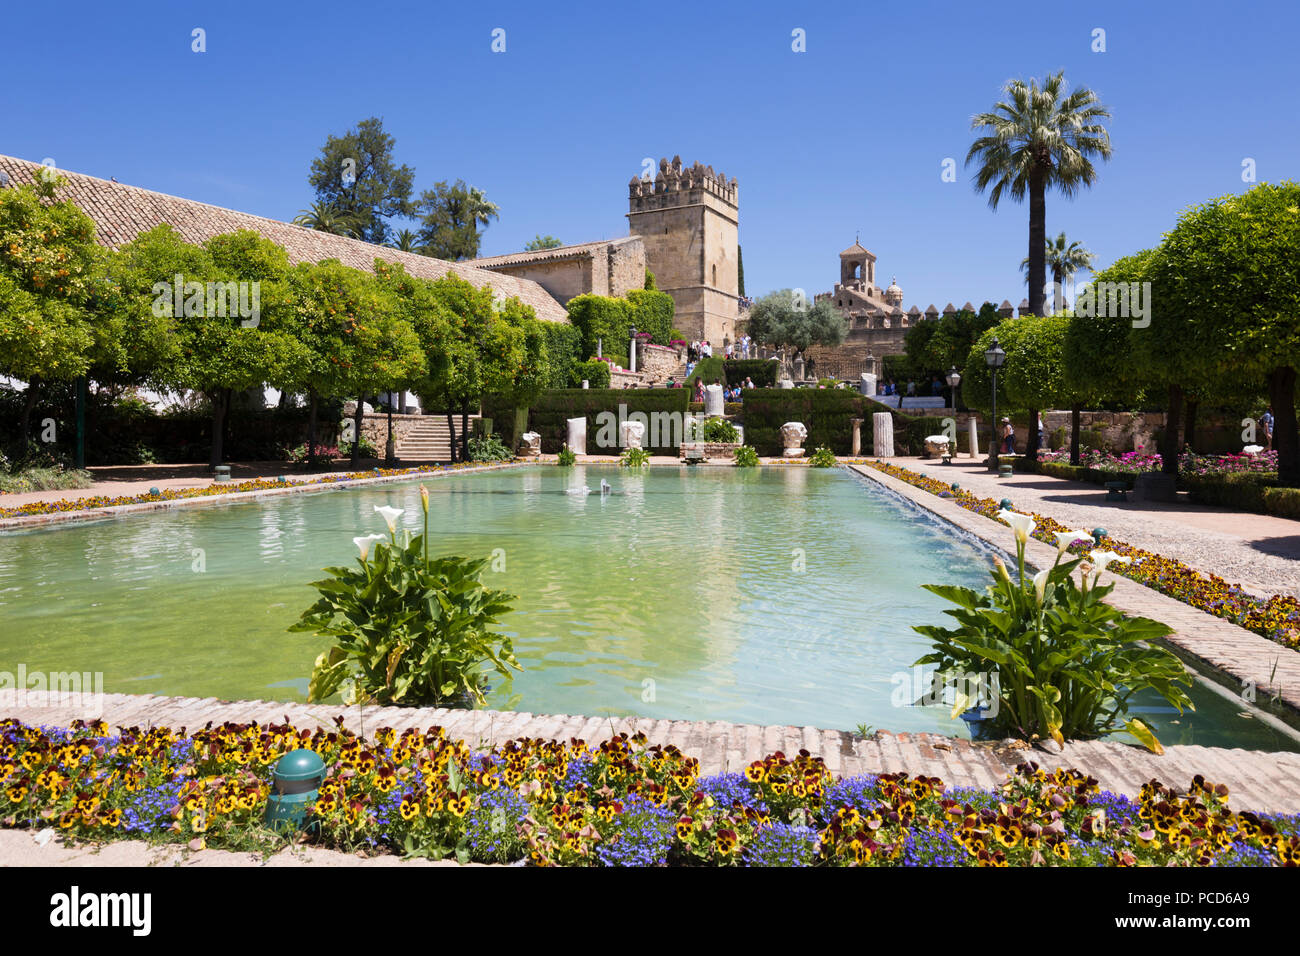 Jardins de l'Alcazar de los Reyes Cristianos, UNESCO World Heritage Site, Cordoue, Andalousie, Espagne, Europe Photo Stock